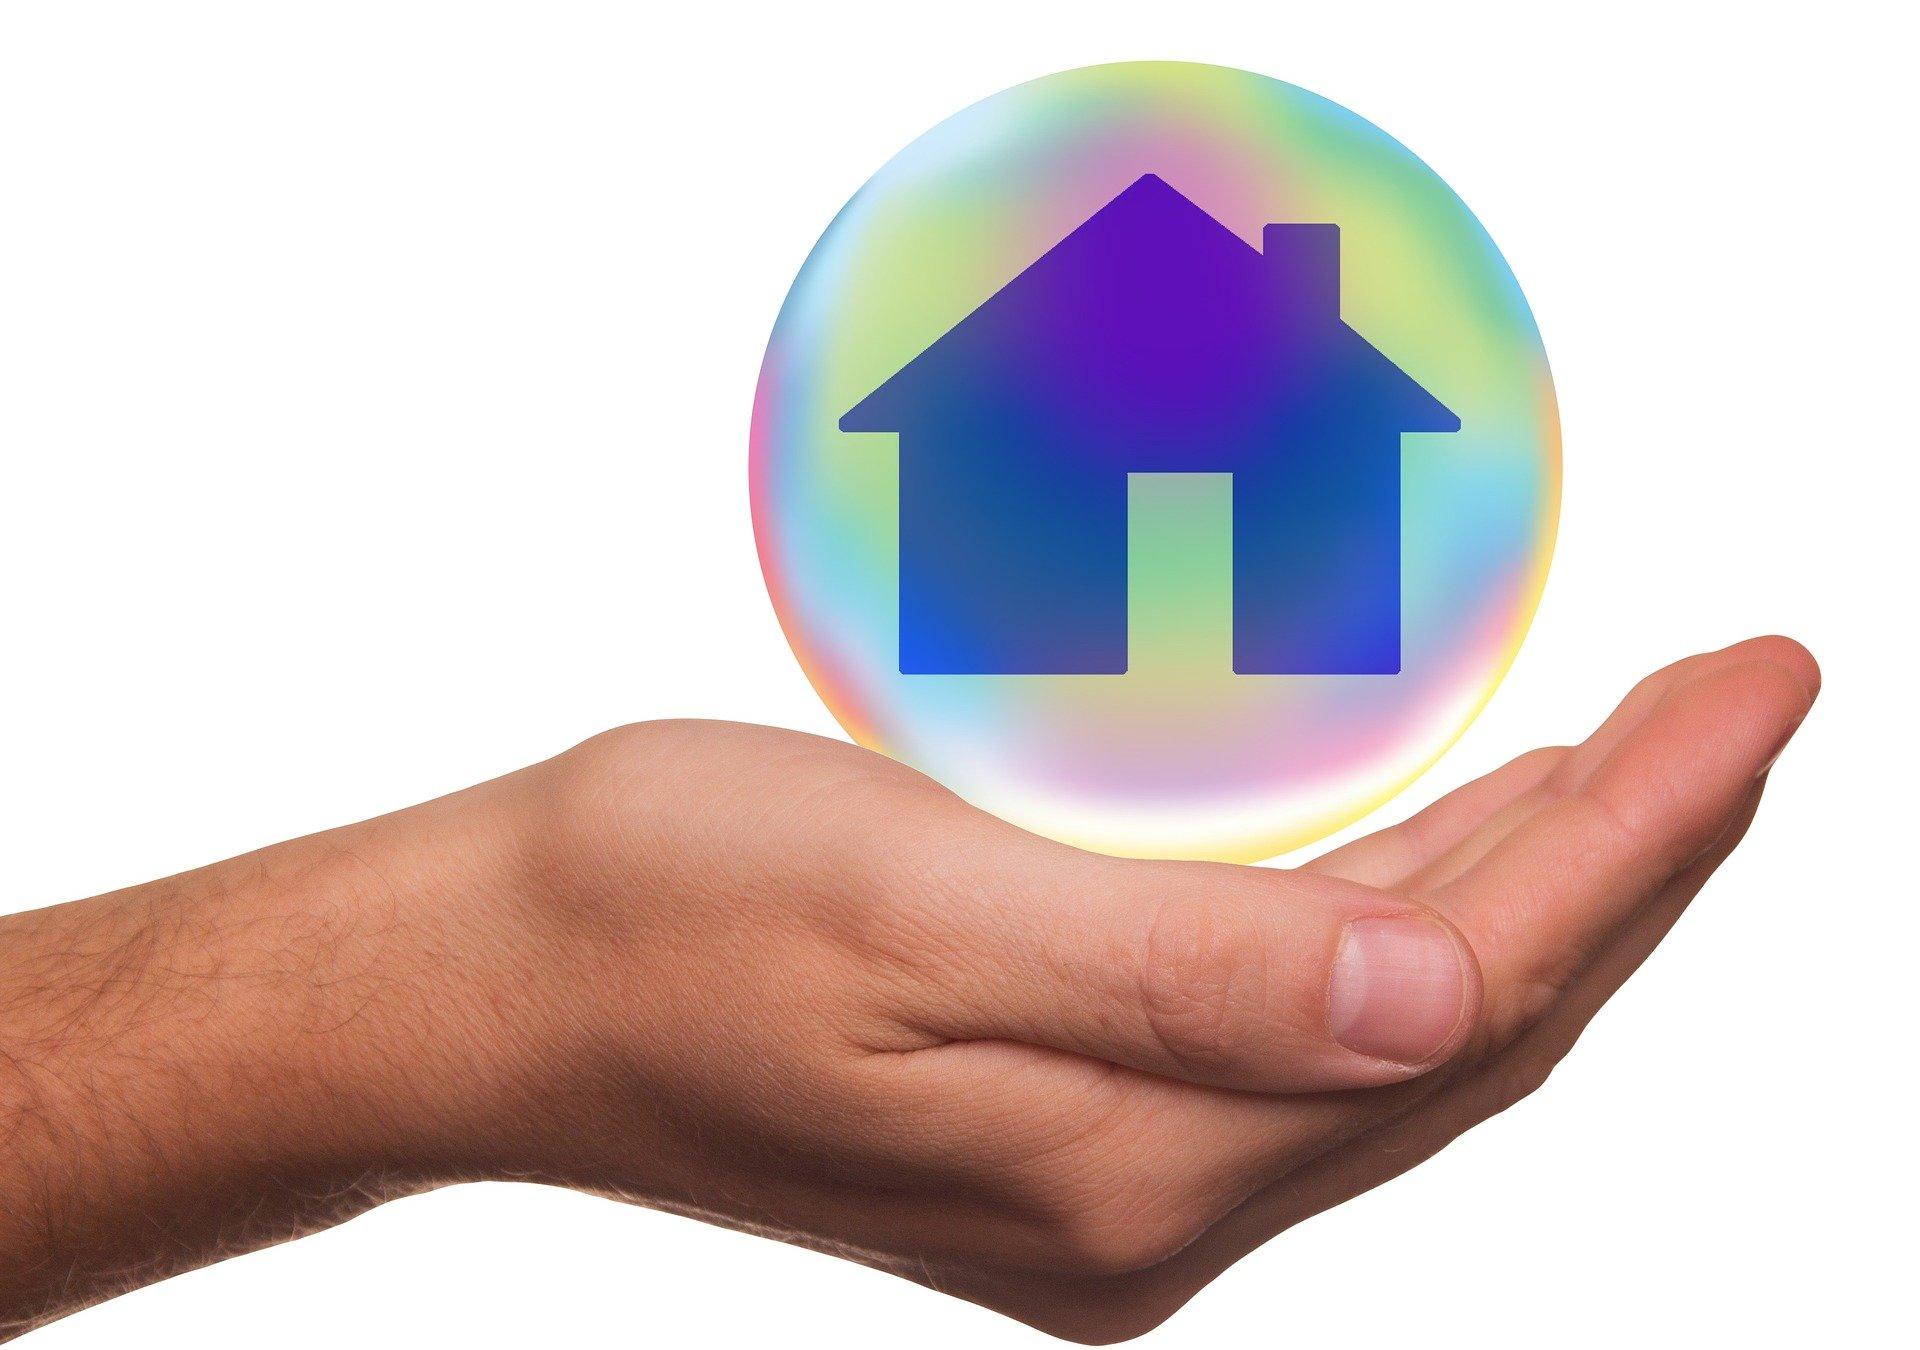 seguros de hogar, pólizas, Filomena